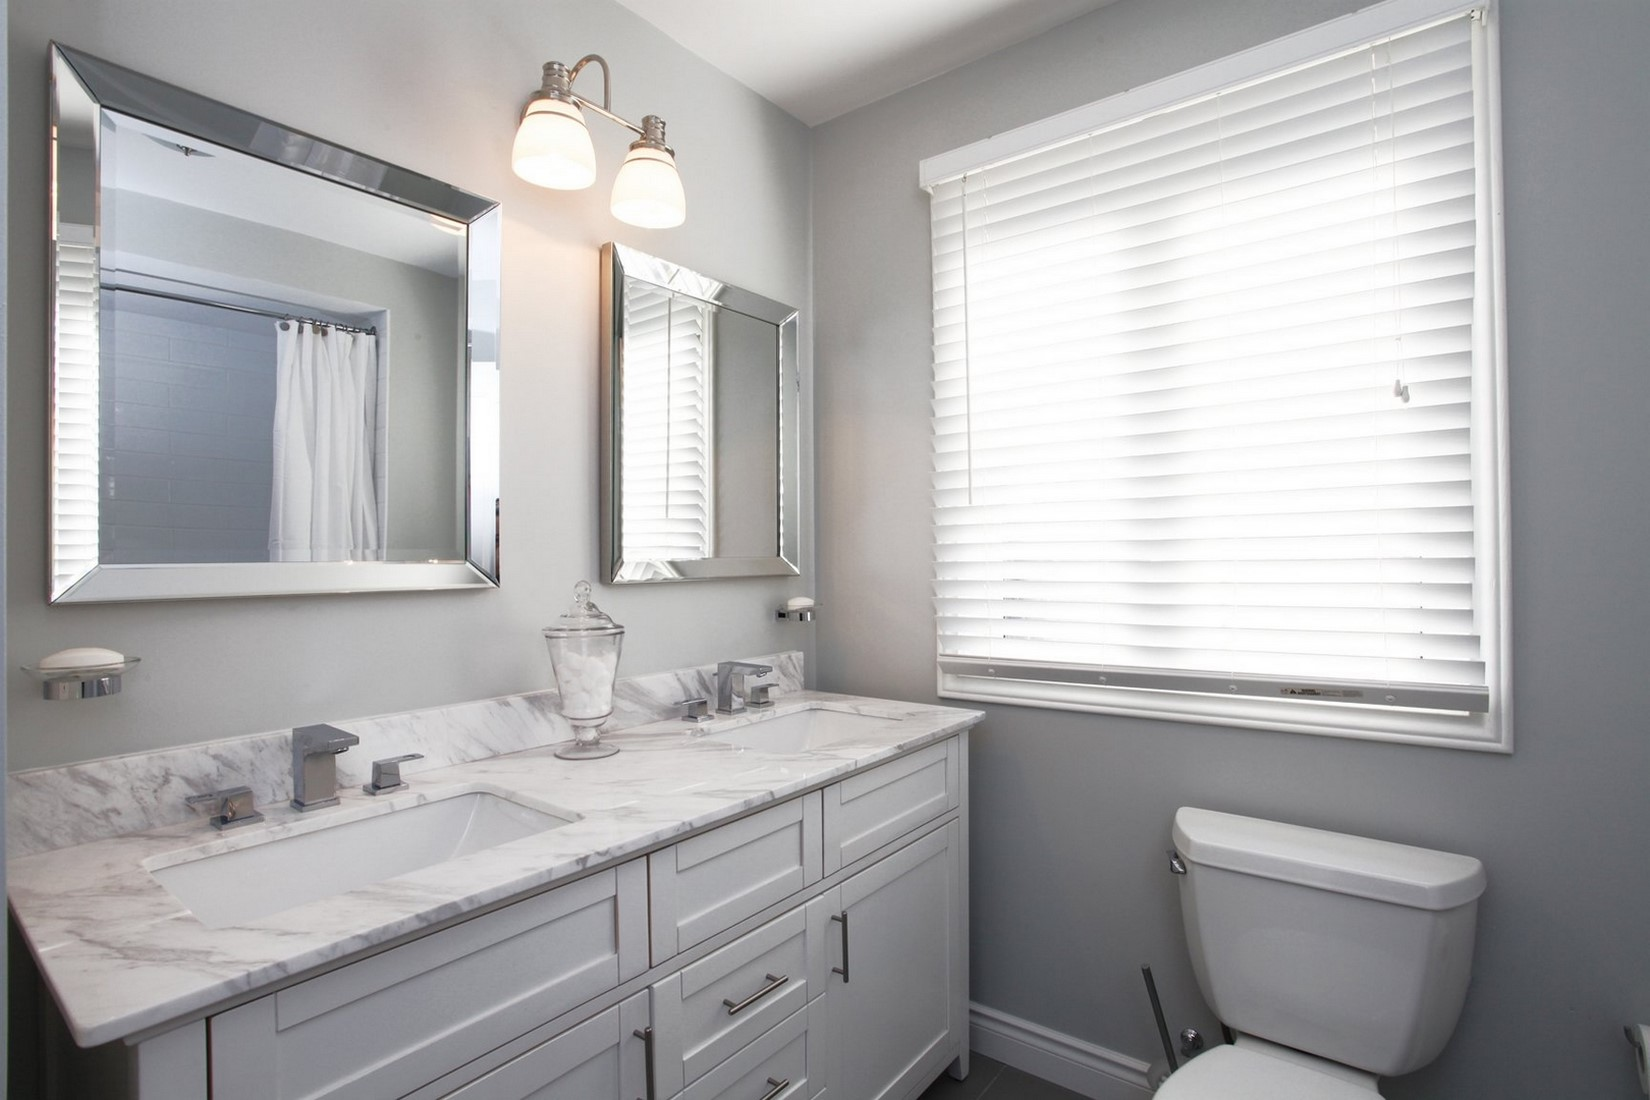 K Design Custom Cabinetry ~ Cudmore k design cabinetry